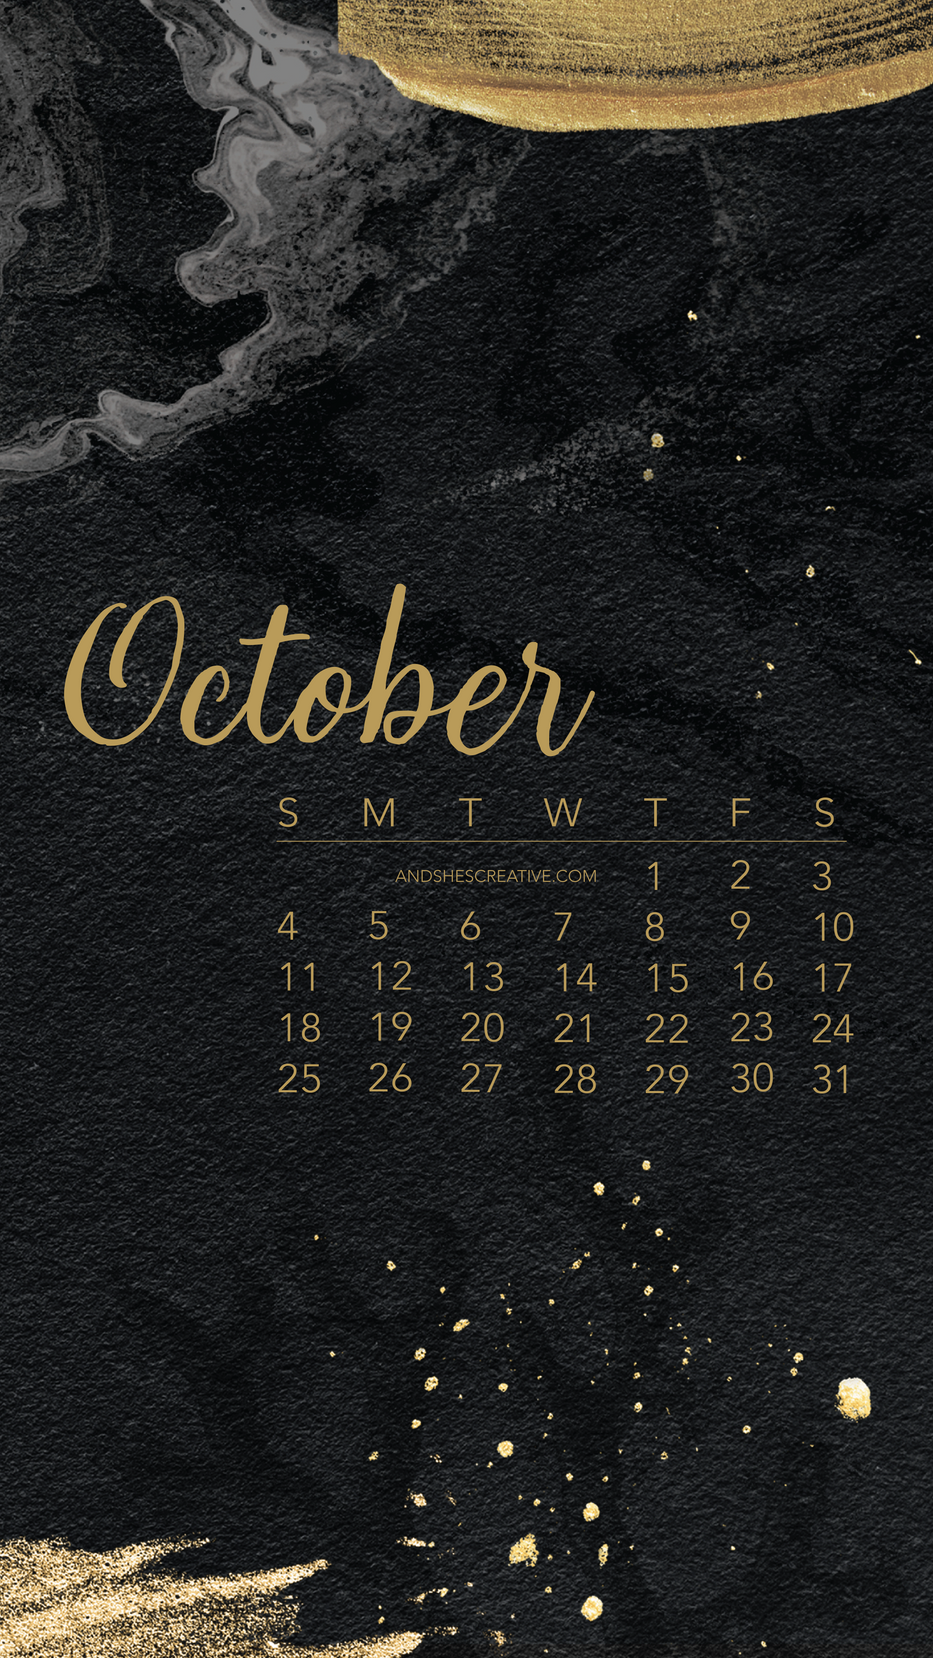 Black and Gold October Mobile Background